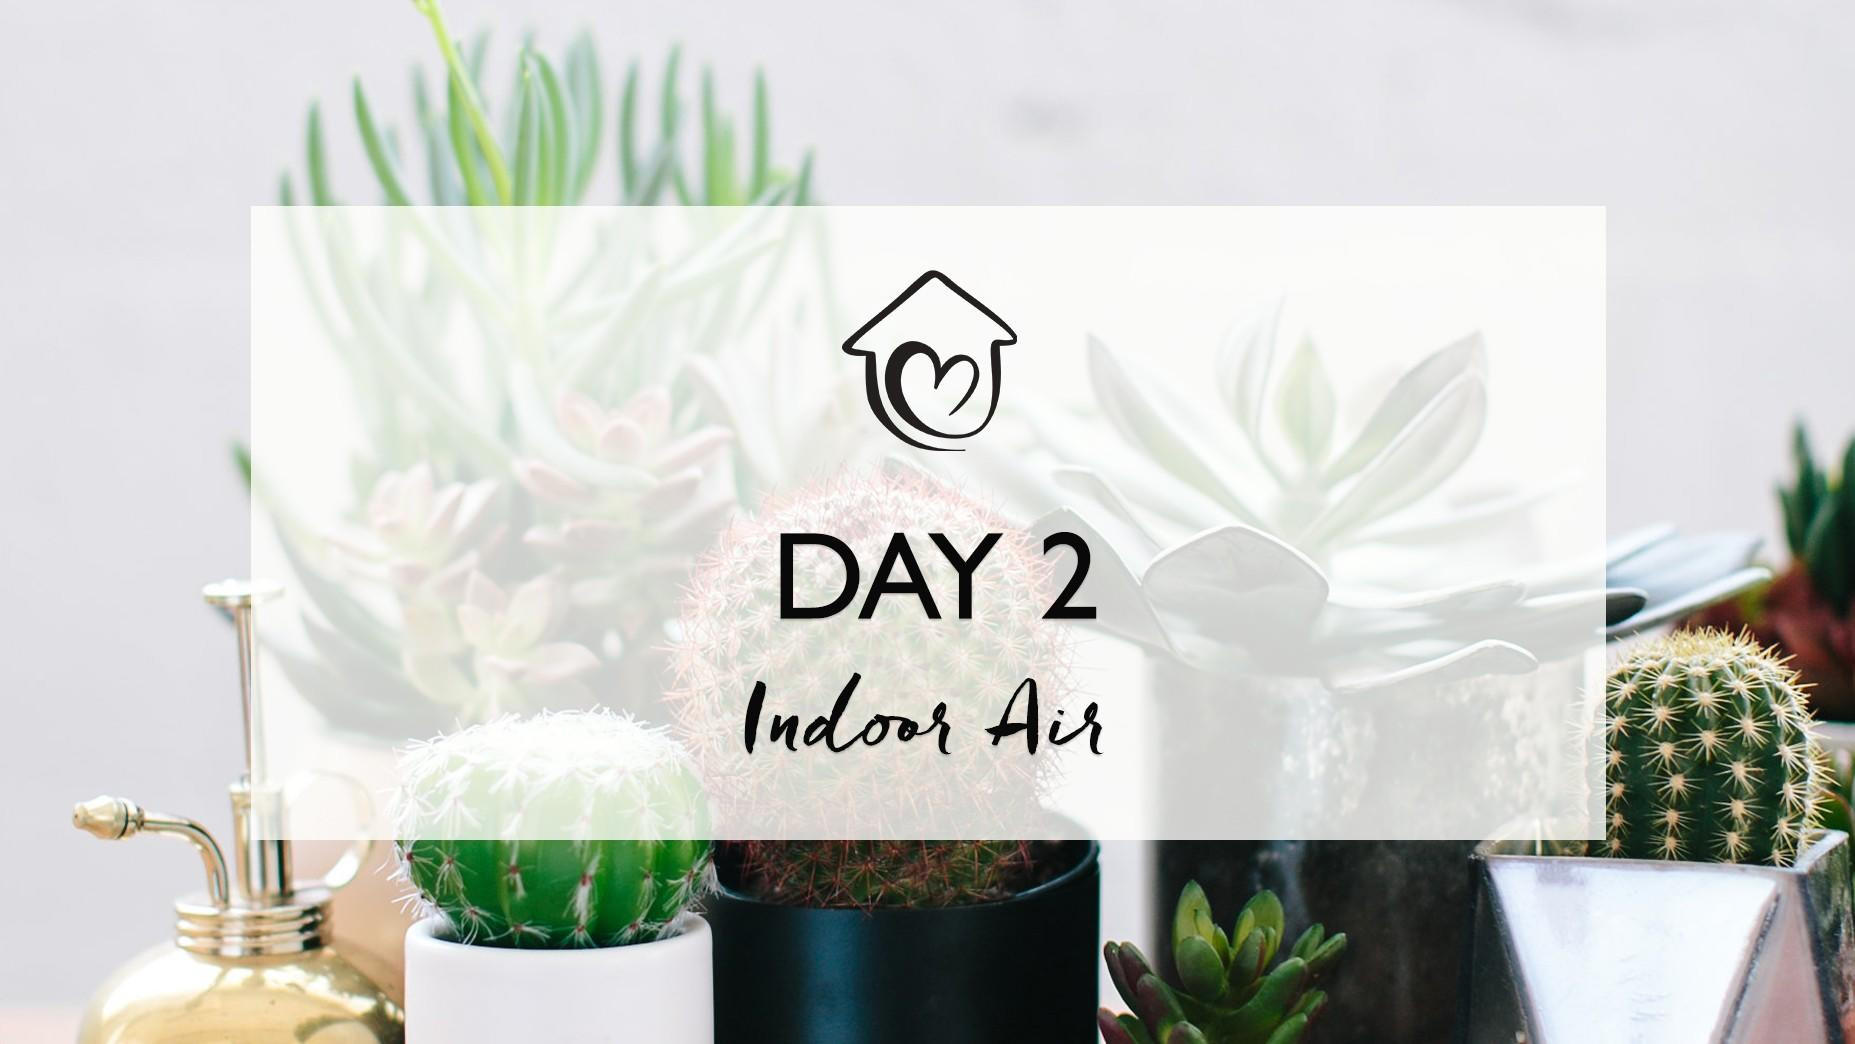 Day 2 - Indoor Air